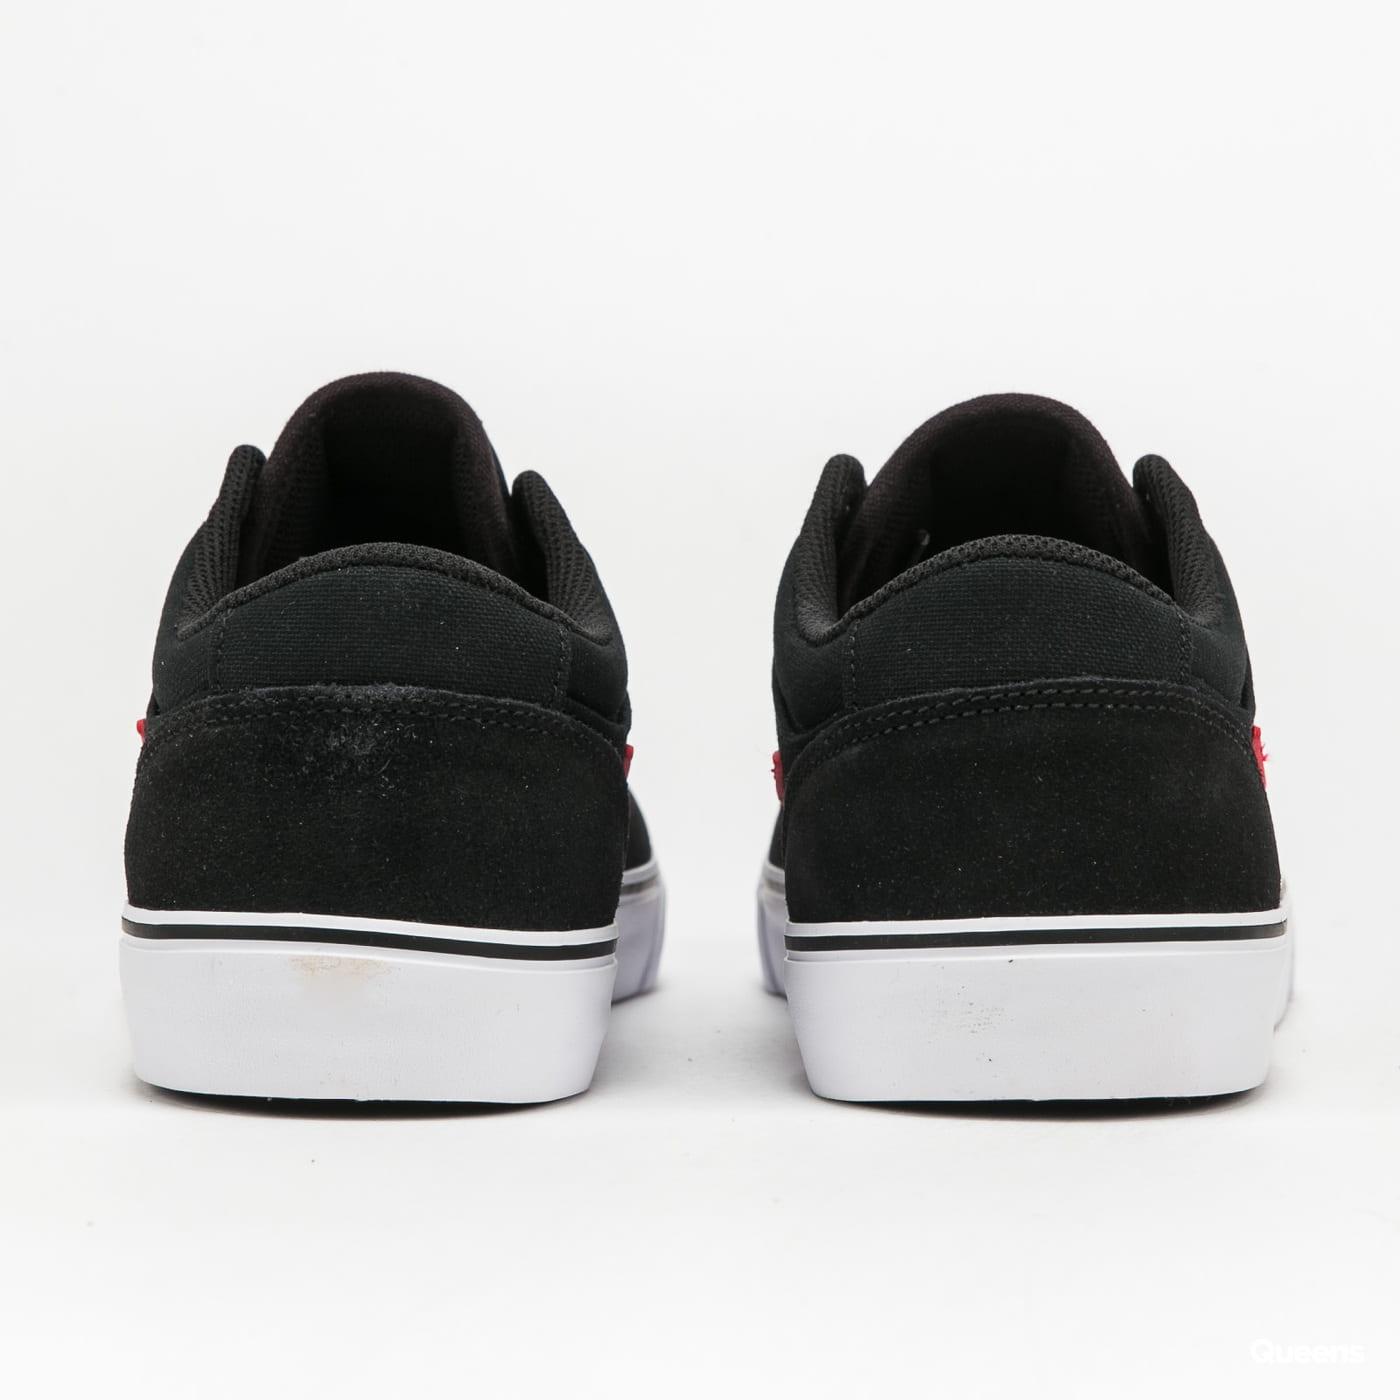 Nike SB Chron 2 black / university red - black